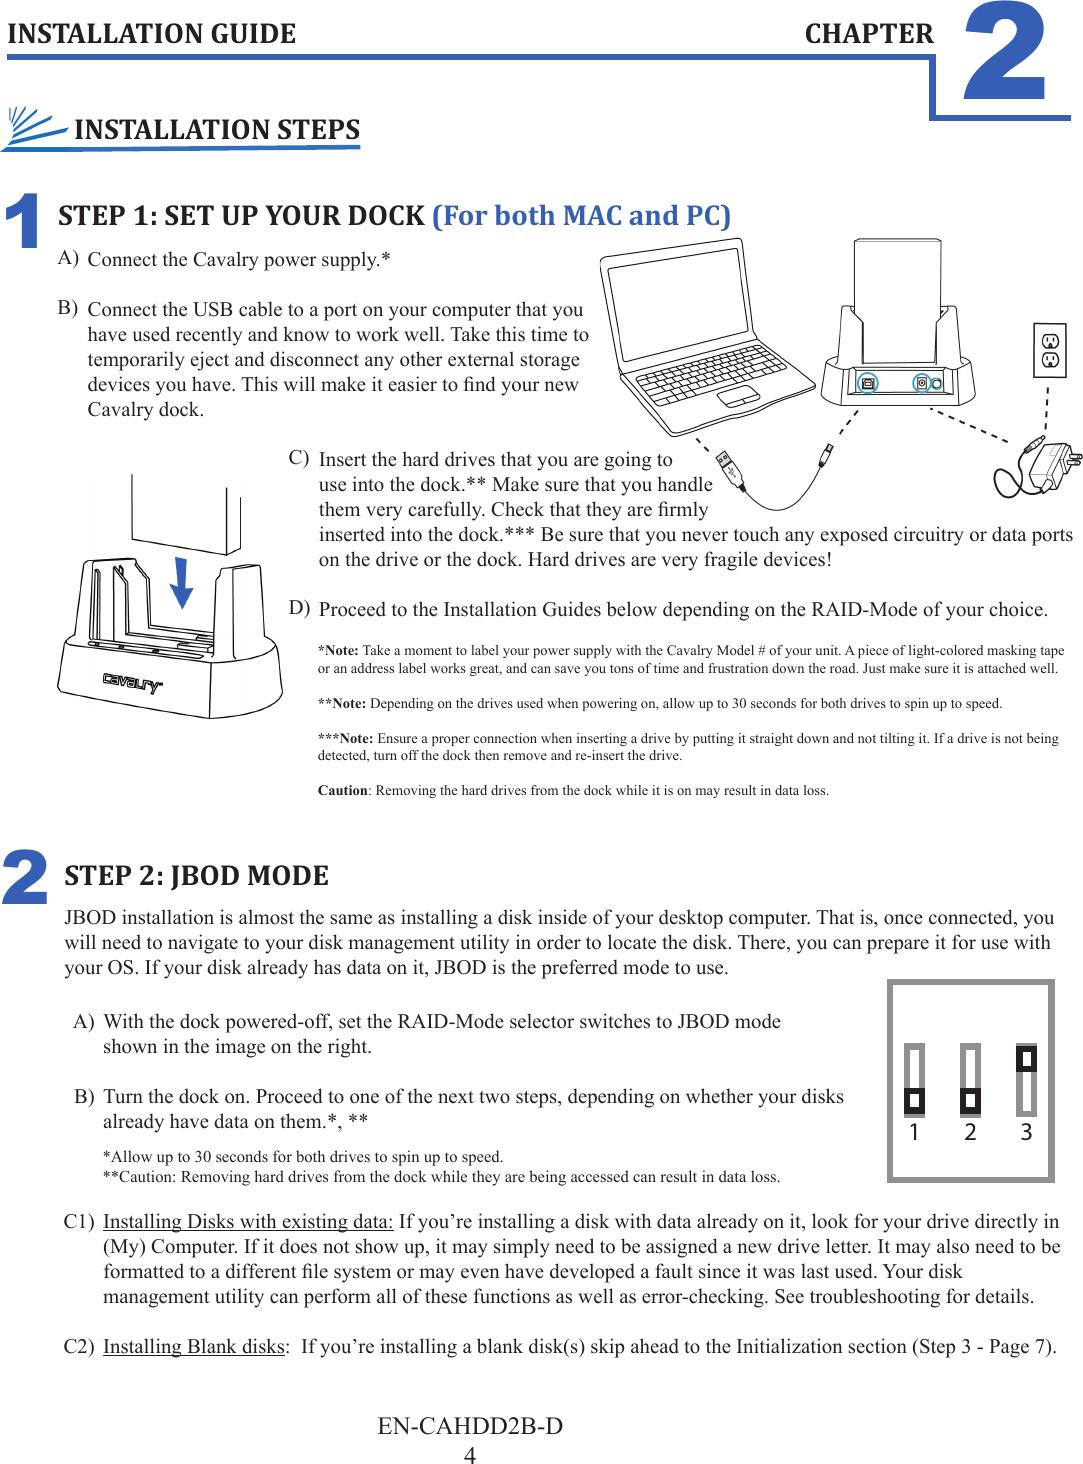 cavalry storage en cahdd2b d users manual rh usermanual wiki User Manual Clip Art User Guide